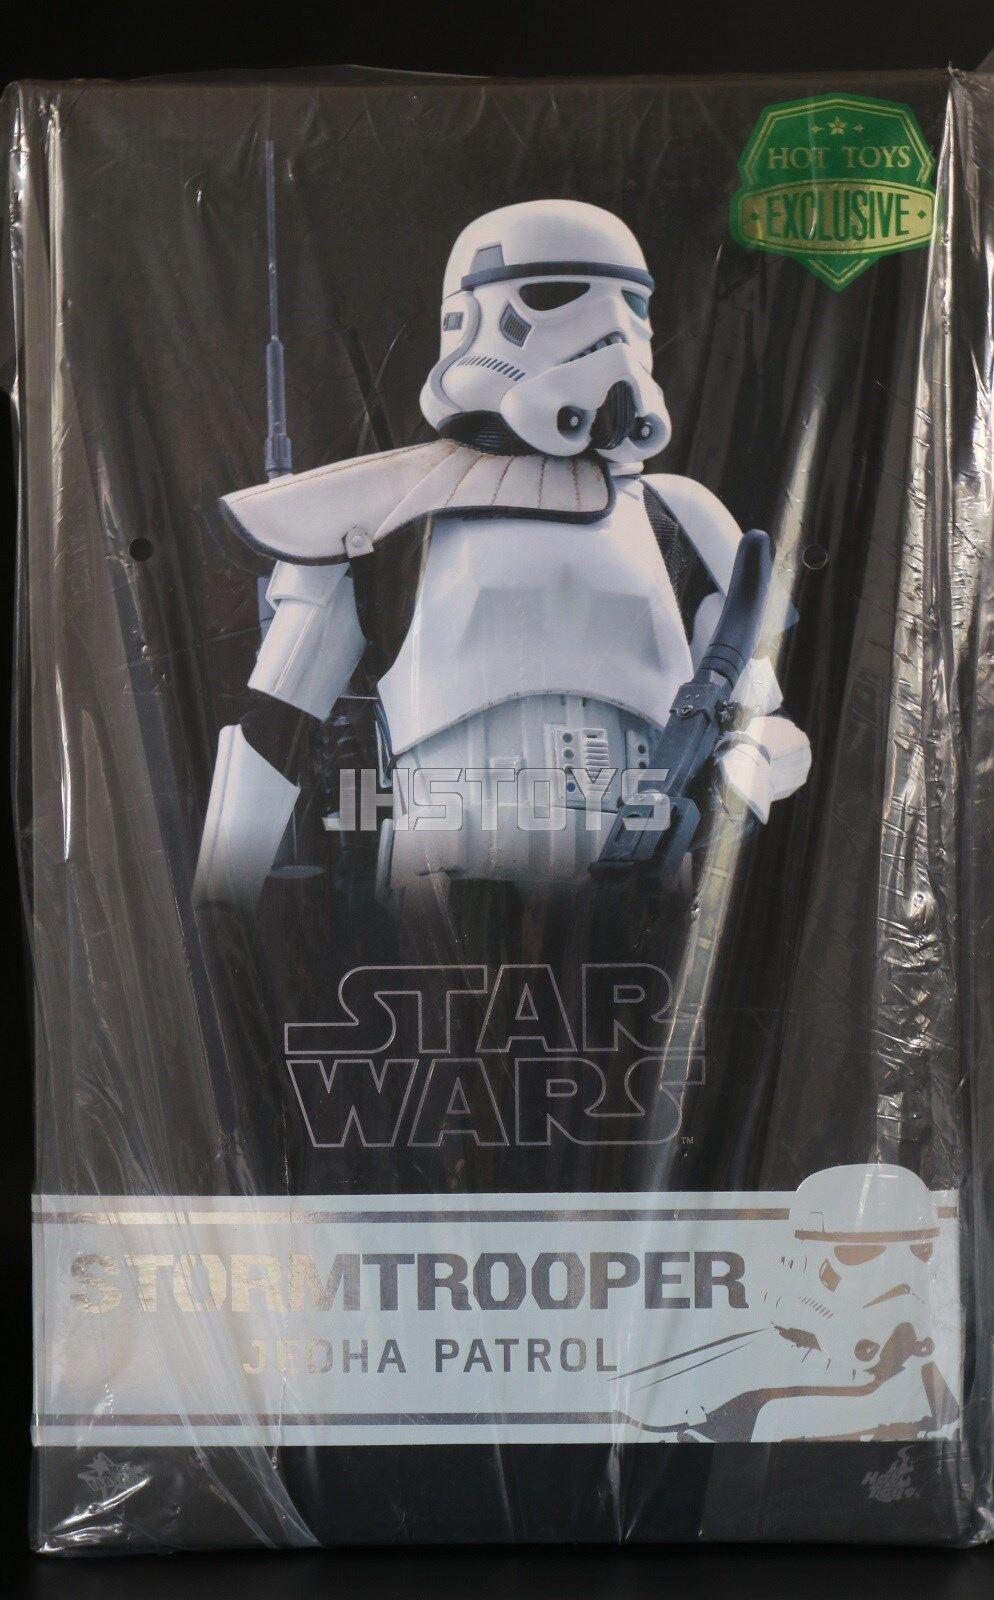 nuovo caliente giocattoli 16 estrella guerras Rogue One Stormtrooper Jedha Patrol MMS386 EMS